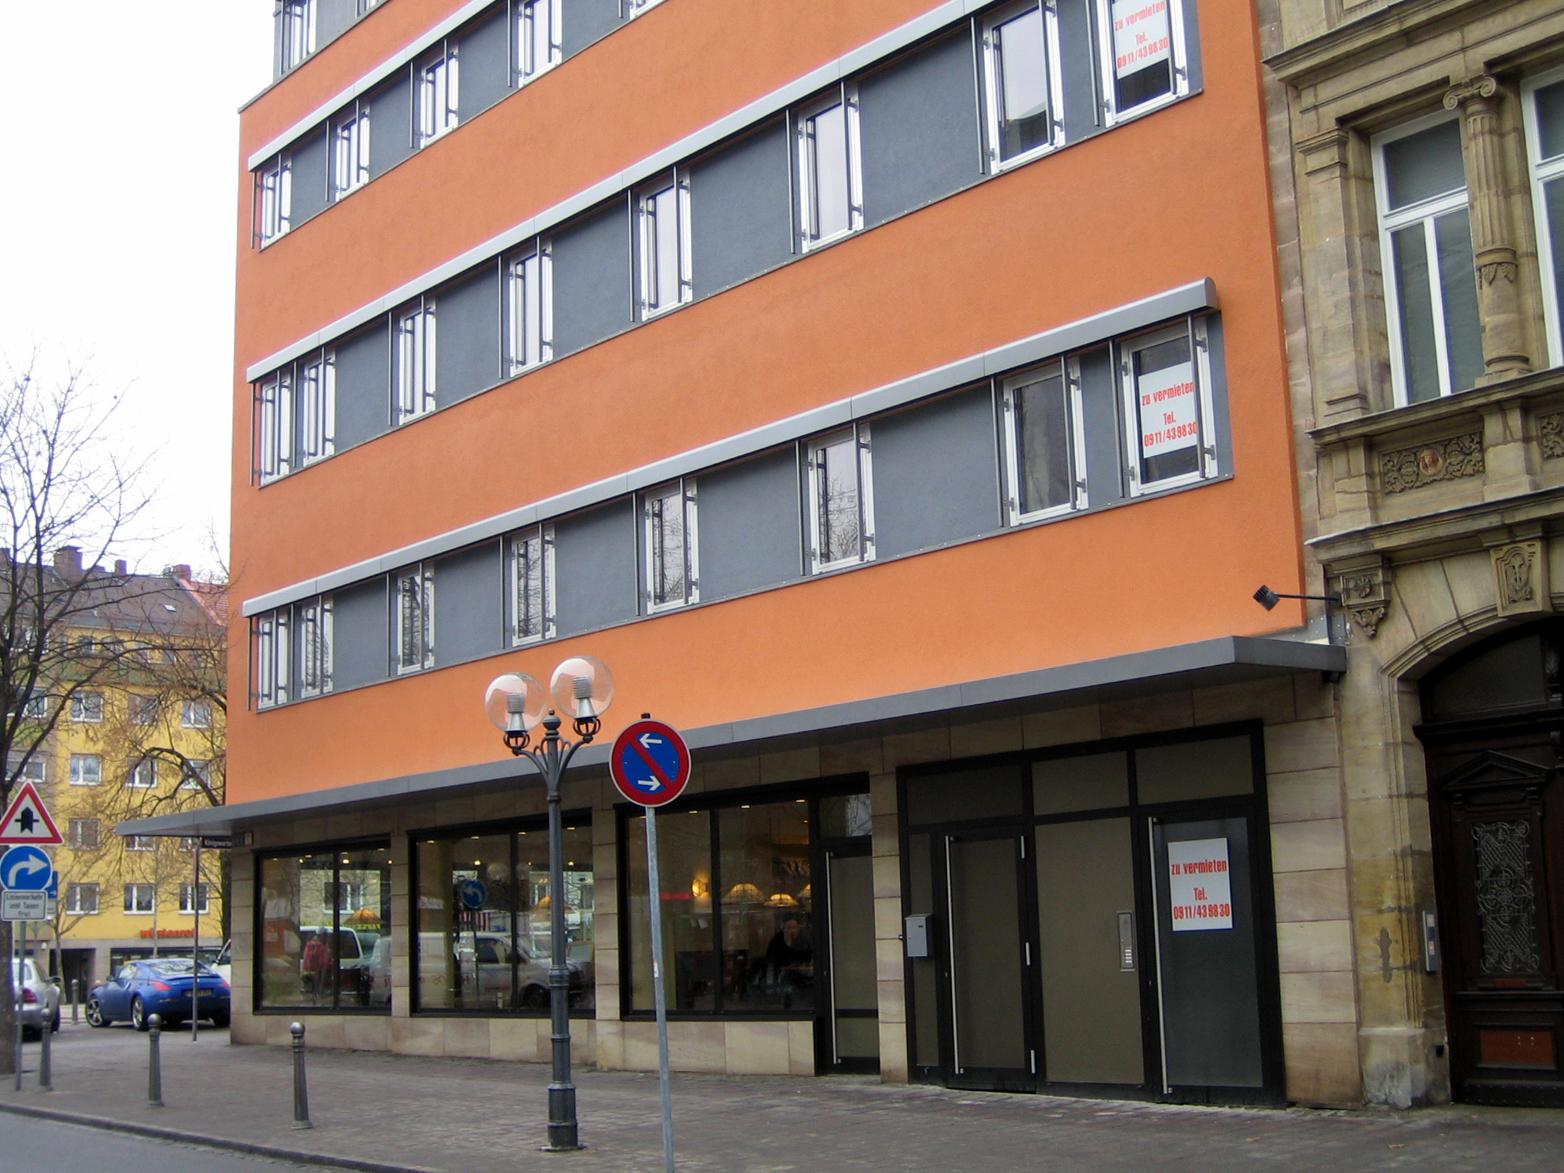 Königswarterstraße